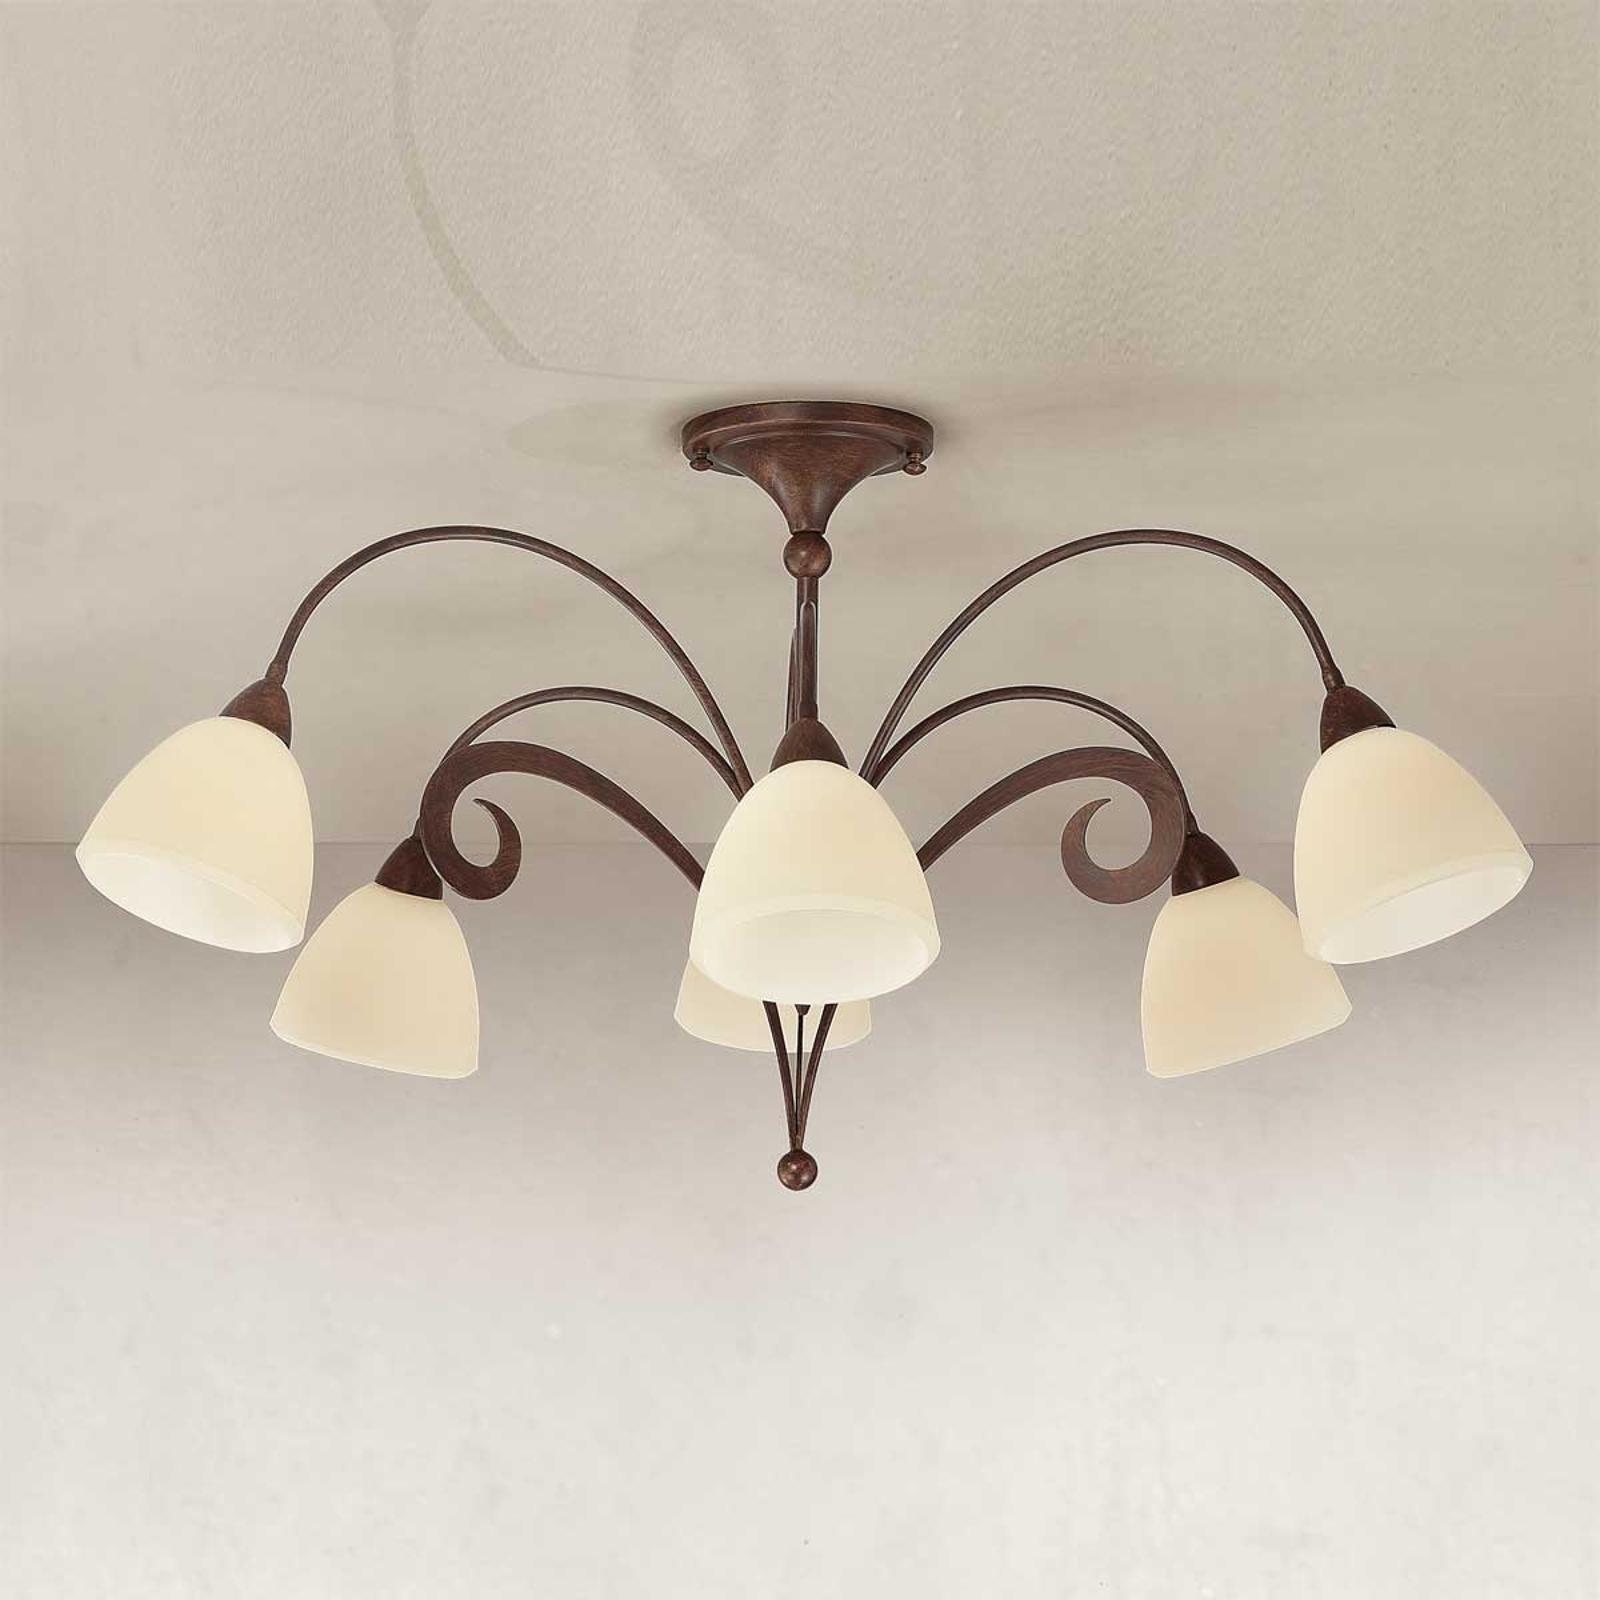 Rustykalna lampa sufitowa Luca 6-punktowa